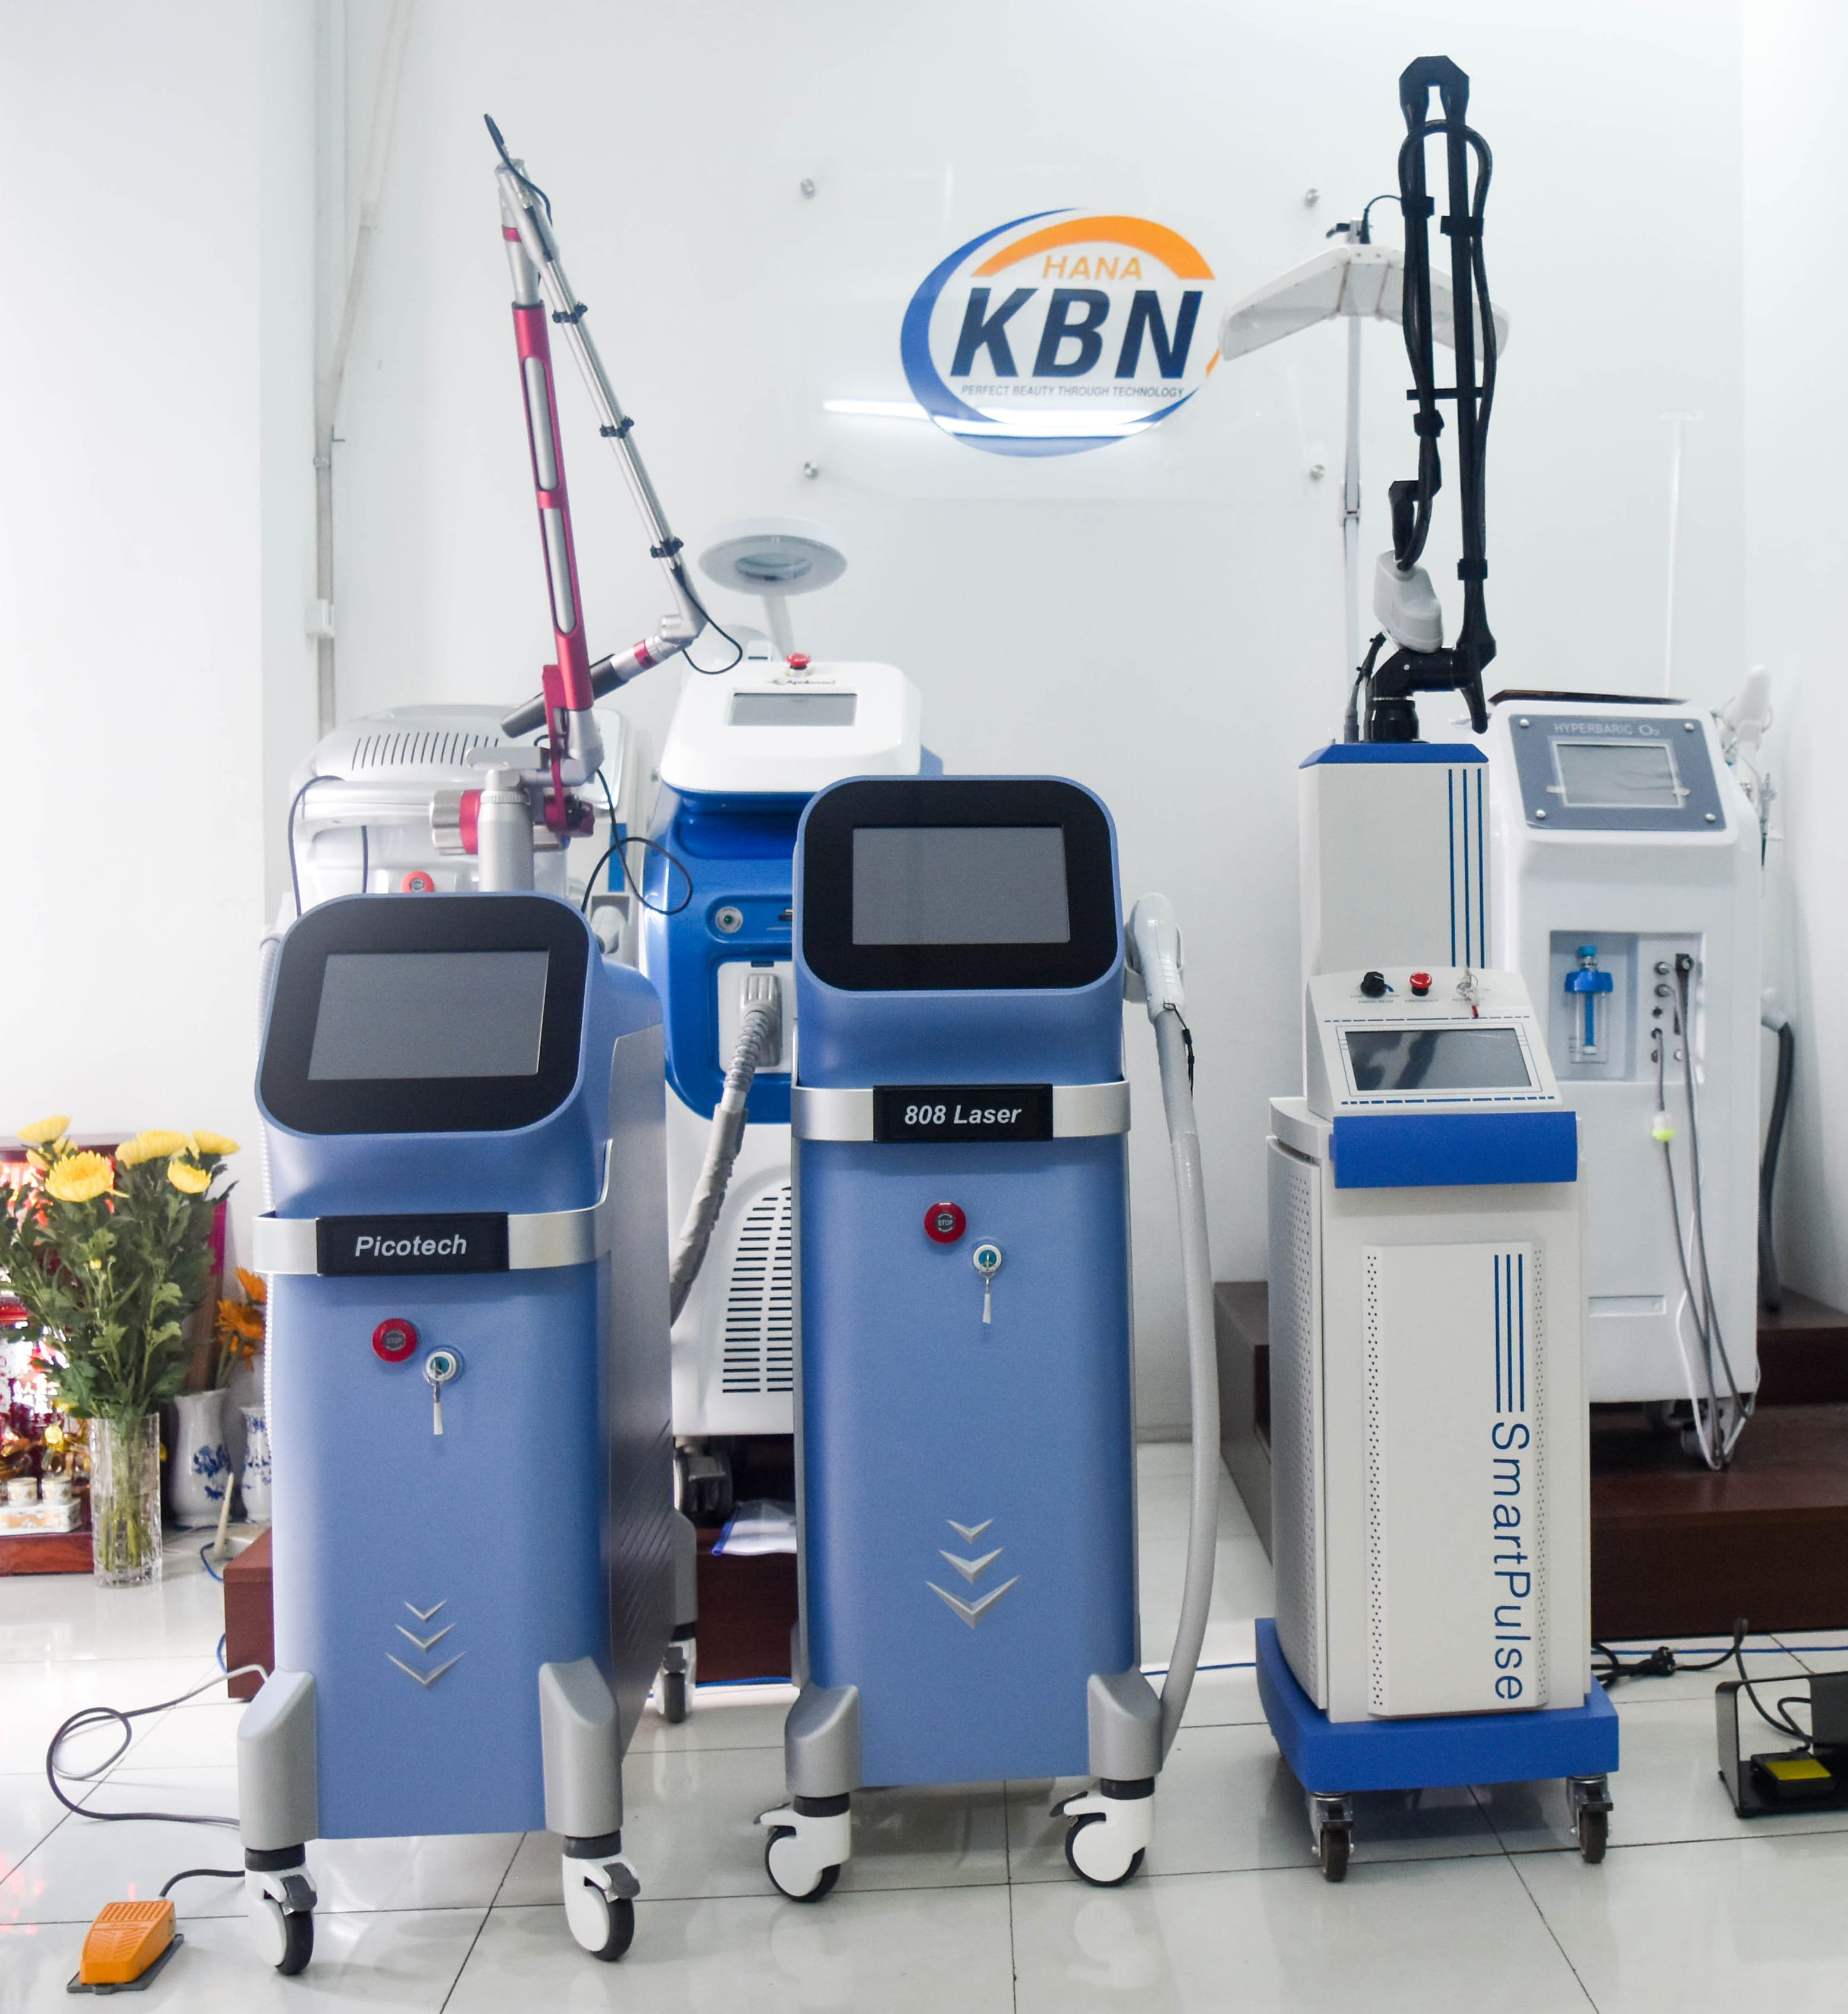 thiết bị thẩm mỹ Laser CO2 Fractional